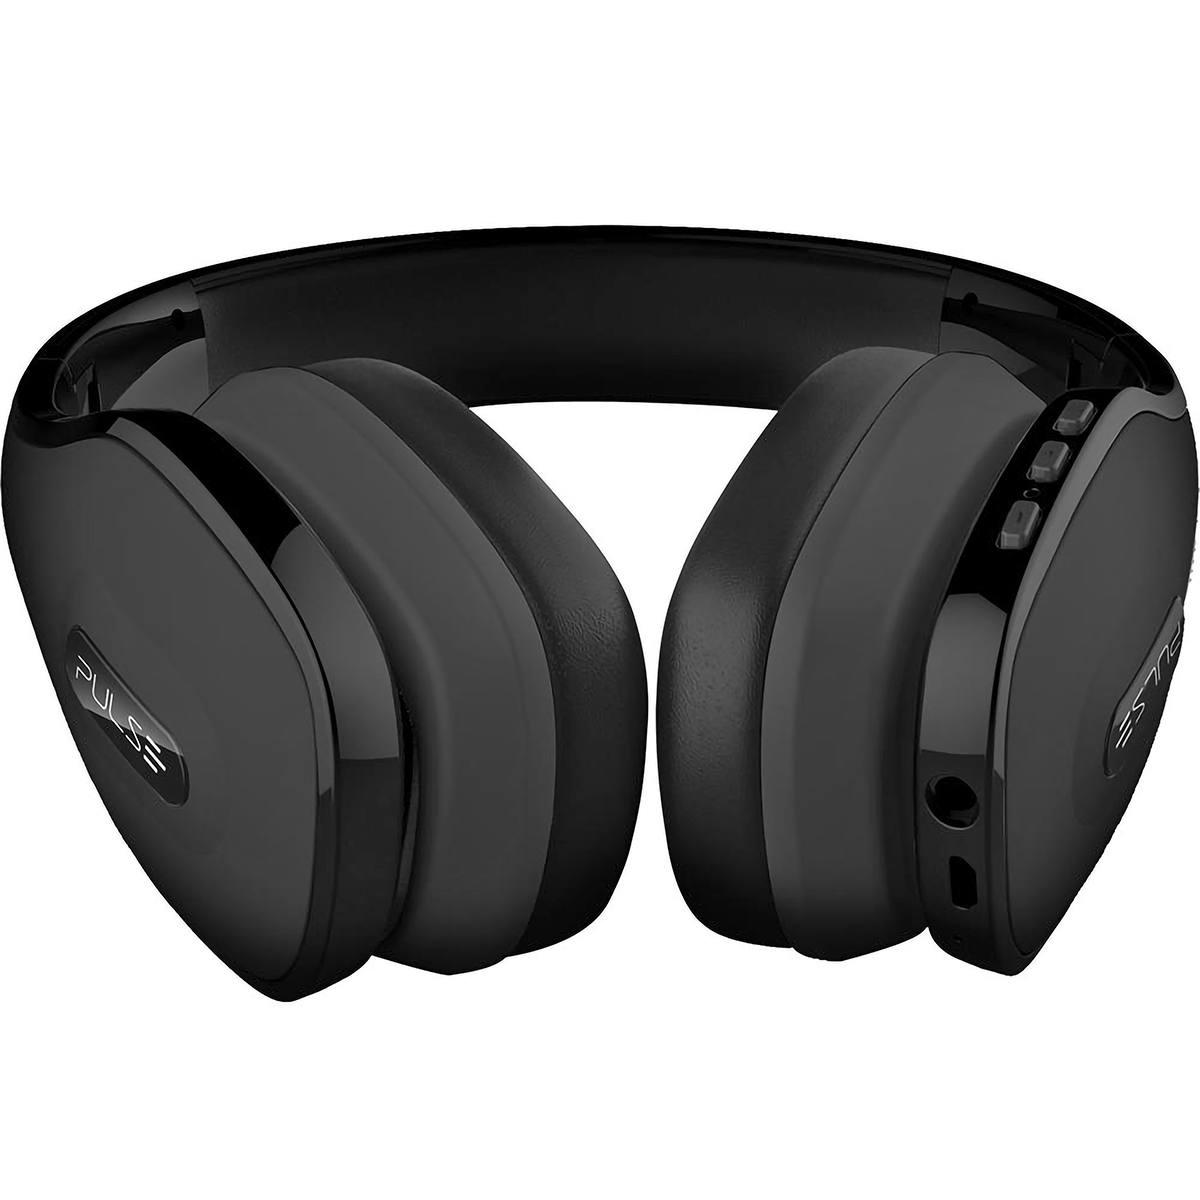 Headphone Bluetooth Over Ear Wireless Stereo Áudio Hands Free com Microfone Pulse PH150 Preto